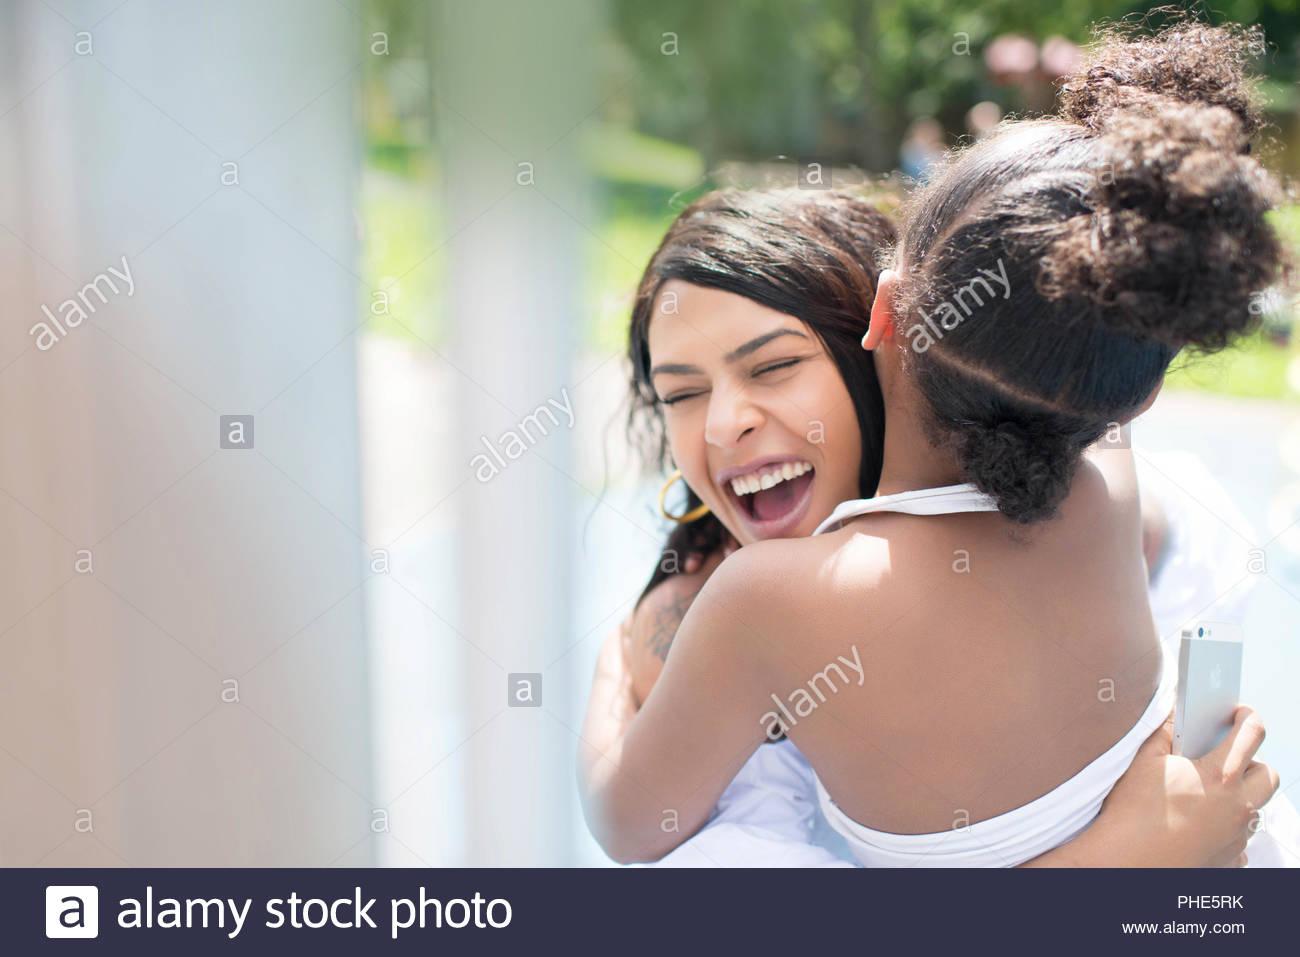 Lächelnde junge Frau ihre Tochter umarmen Stockbild